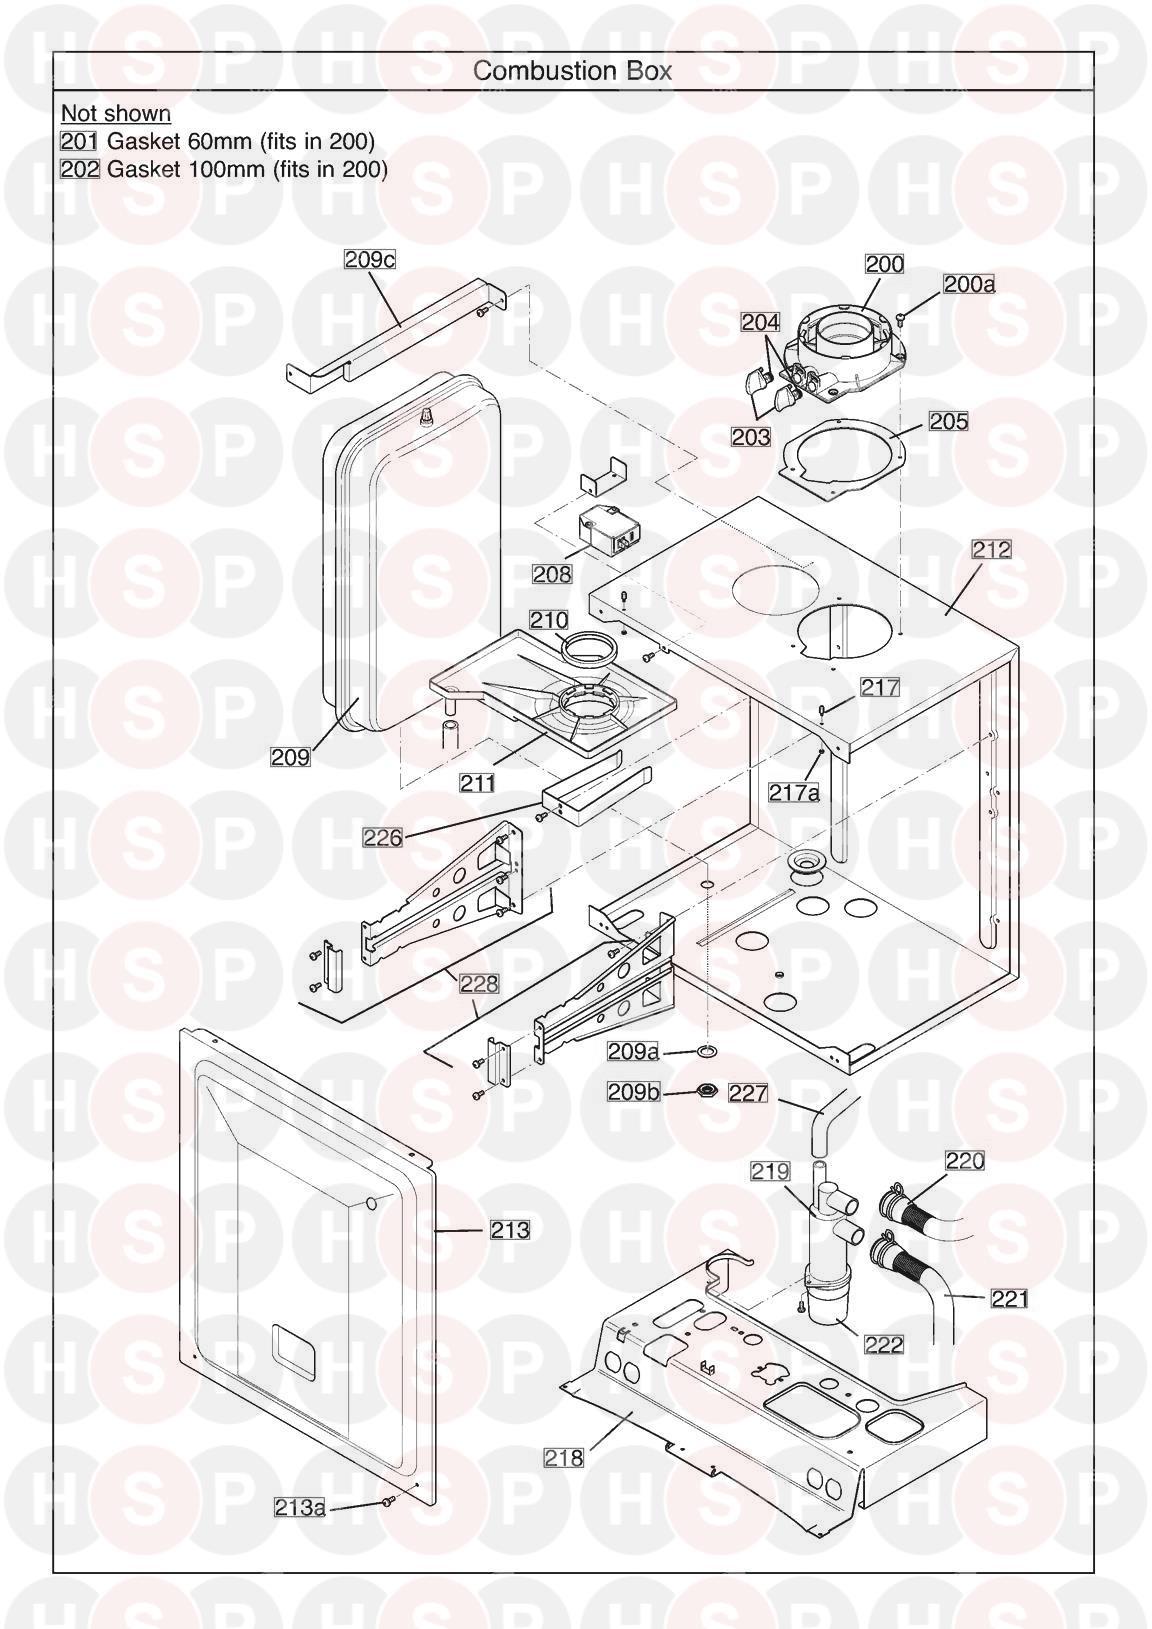 Potterton PROMAX SYSTEM 18 ERP (Combustion Box) Diagram